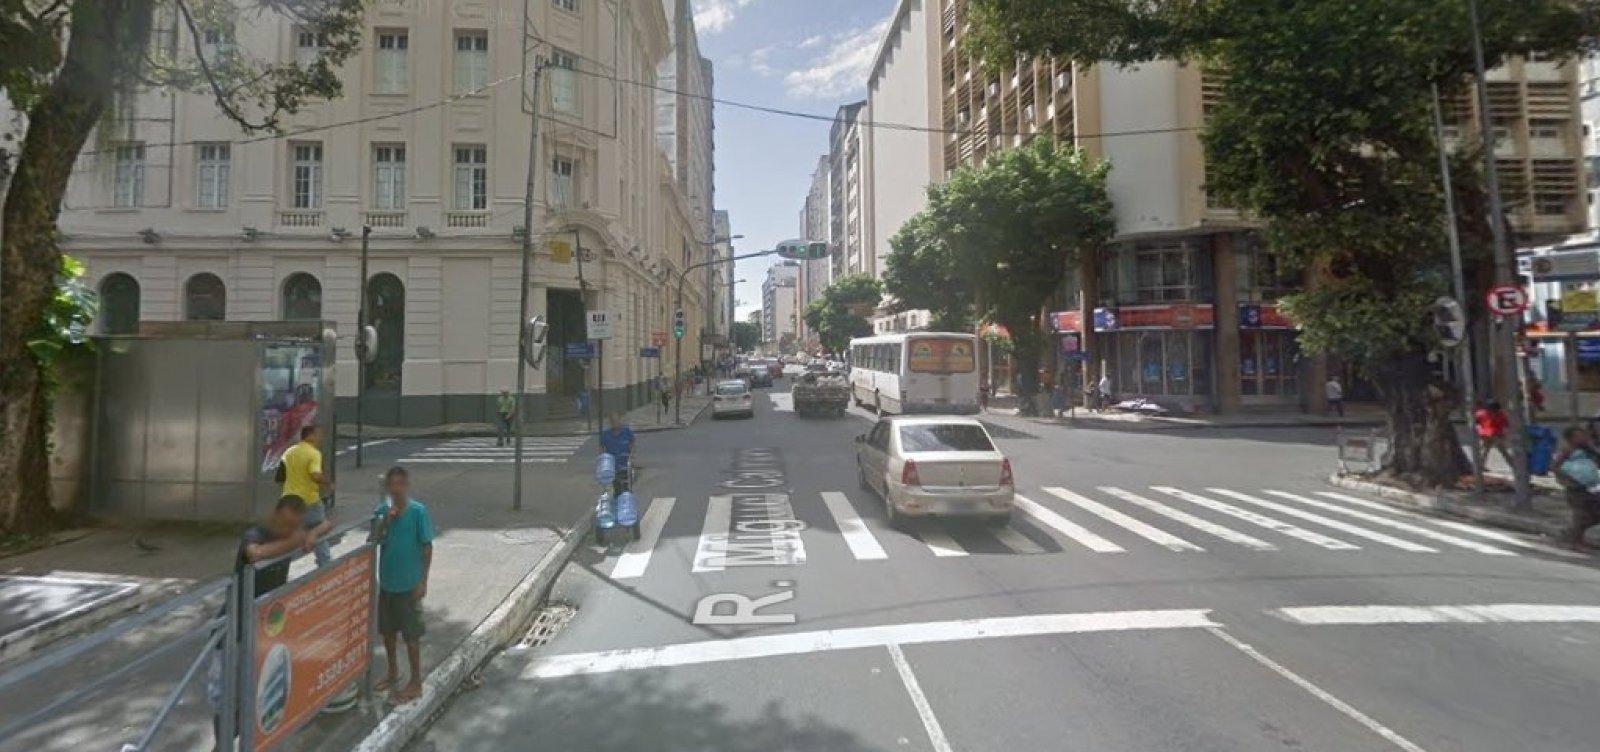 [Tráfego de veículos será interditado amanhã na Rua Miguel Calmon, no Comércio]